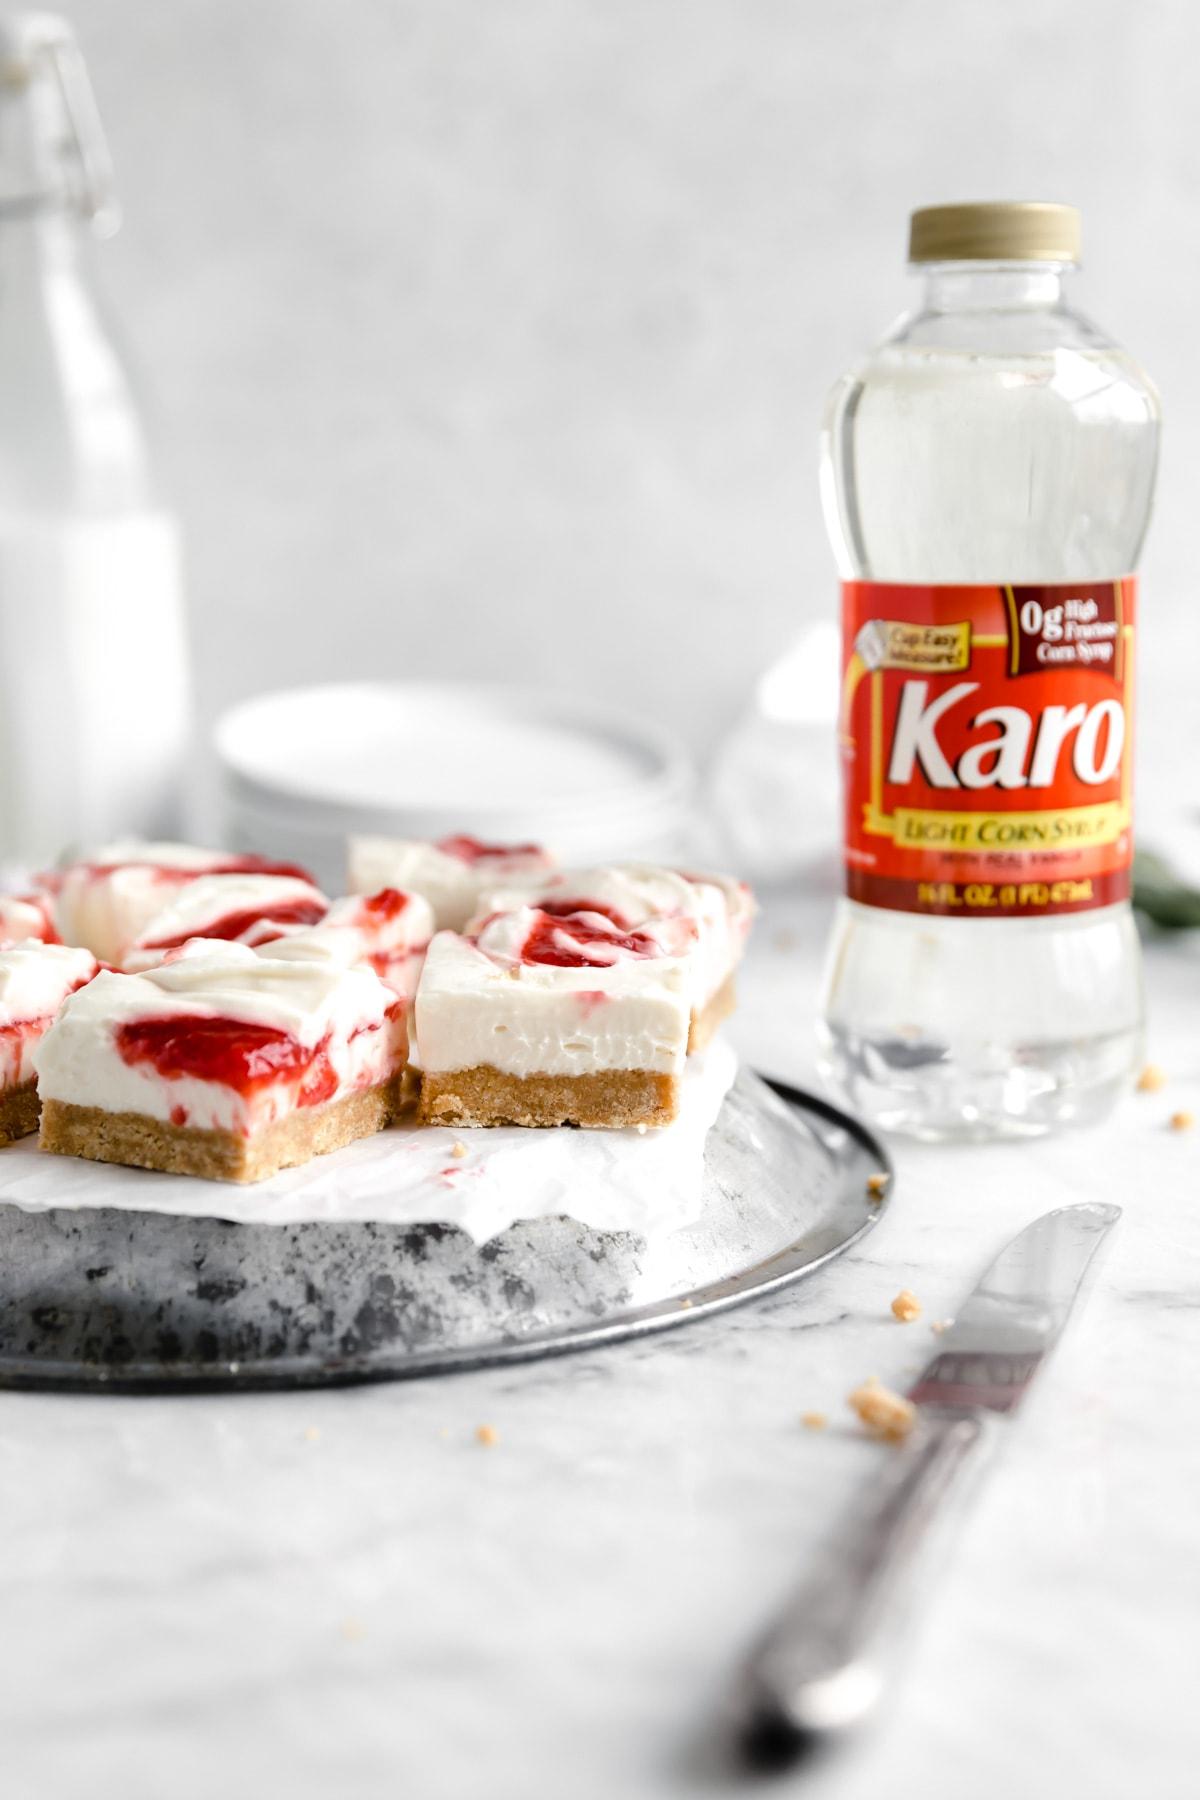 strawberry cheesecake bars with corn syrp